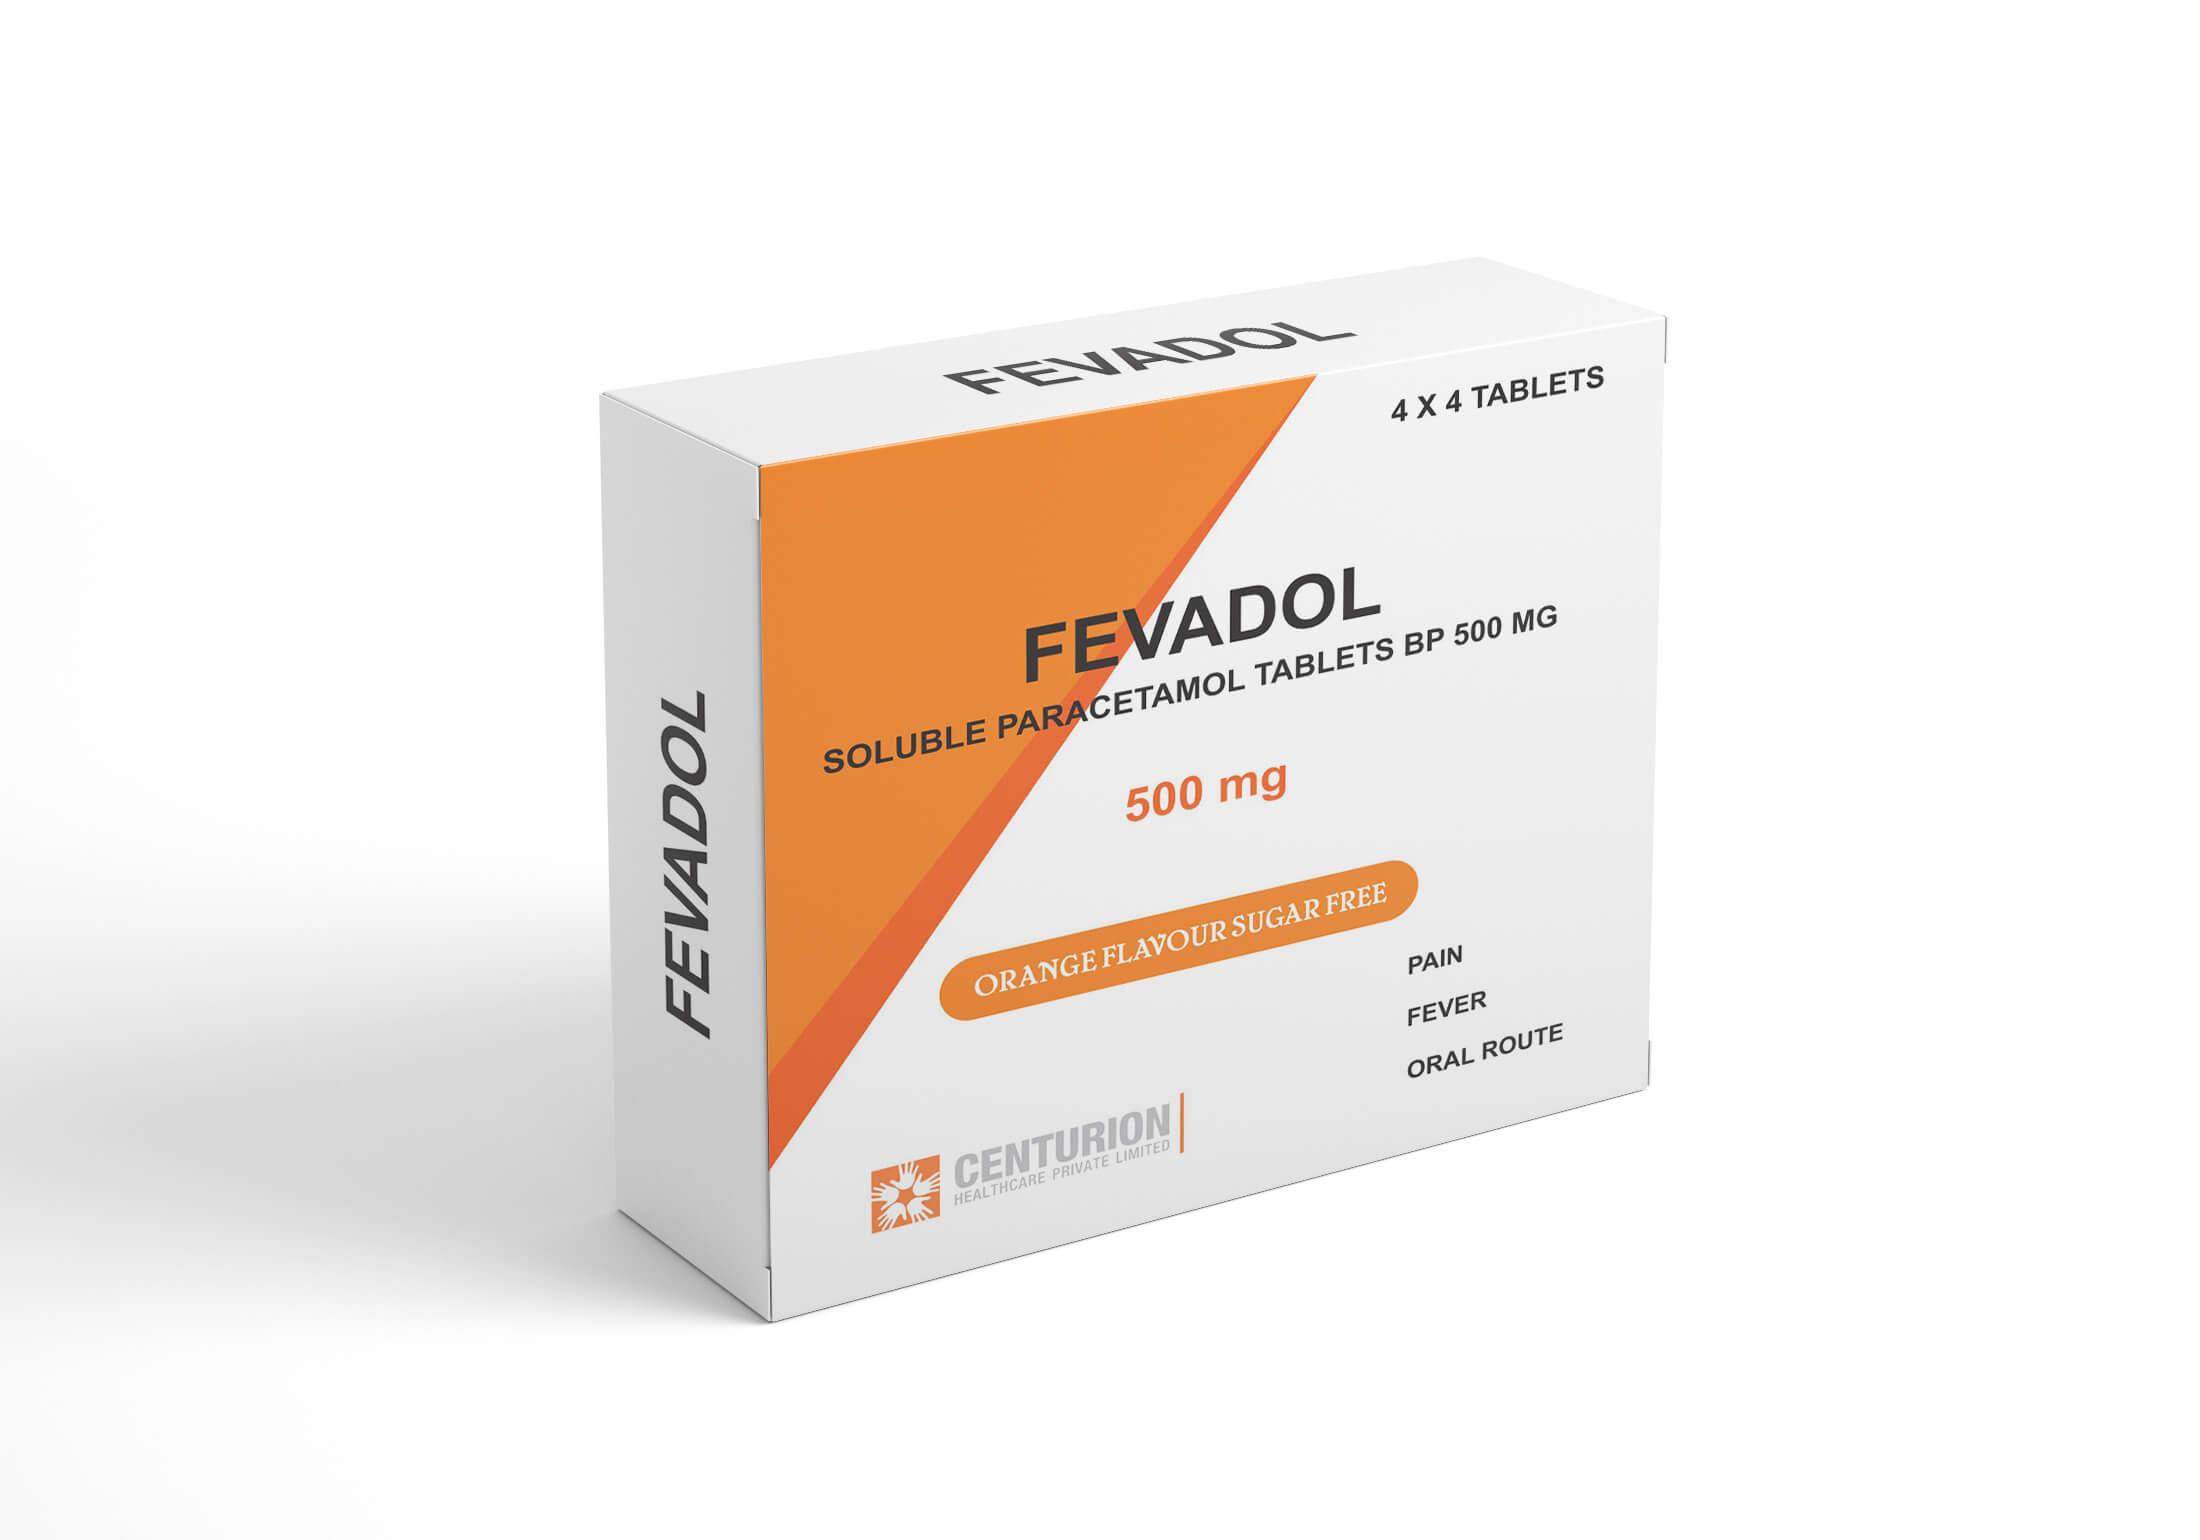 Fevadol 500 tablets